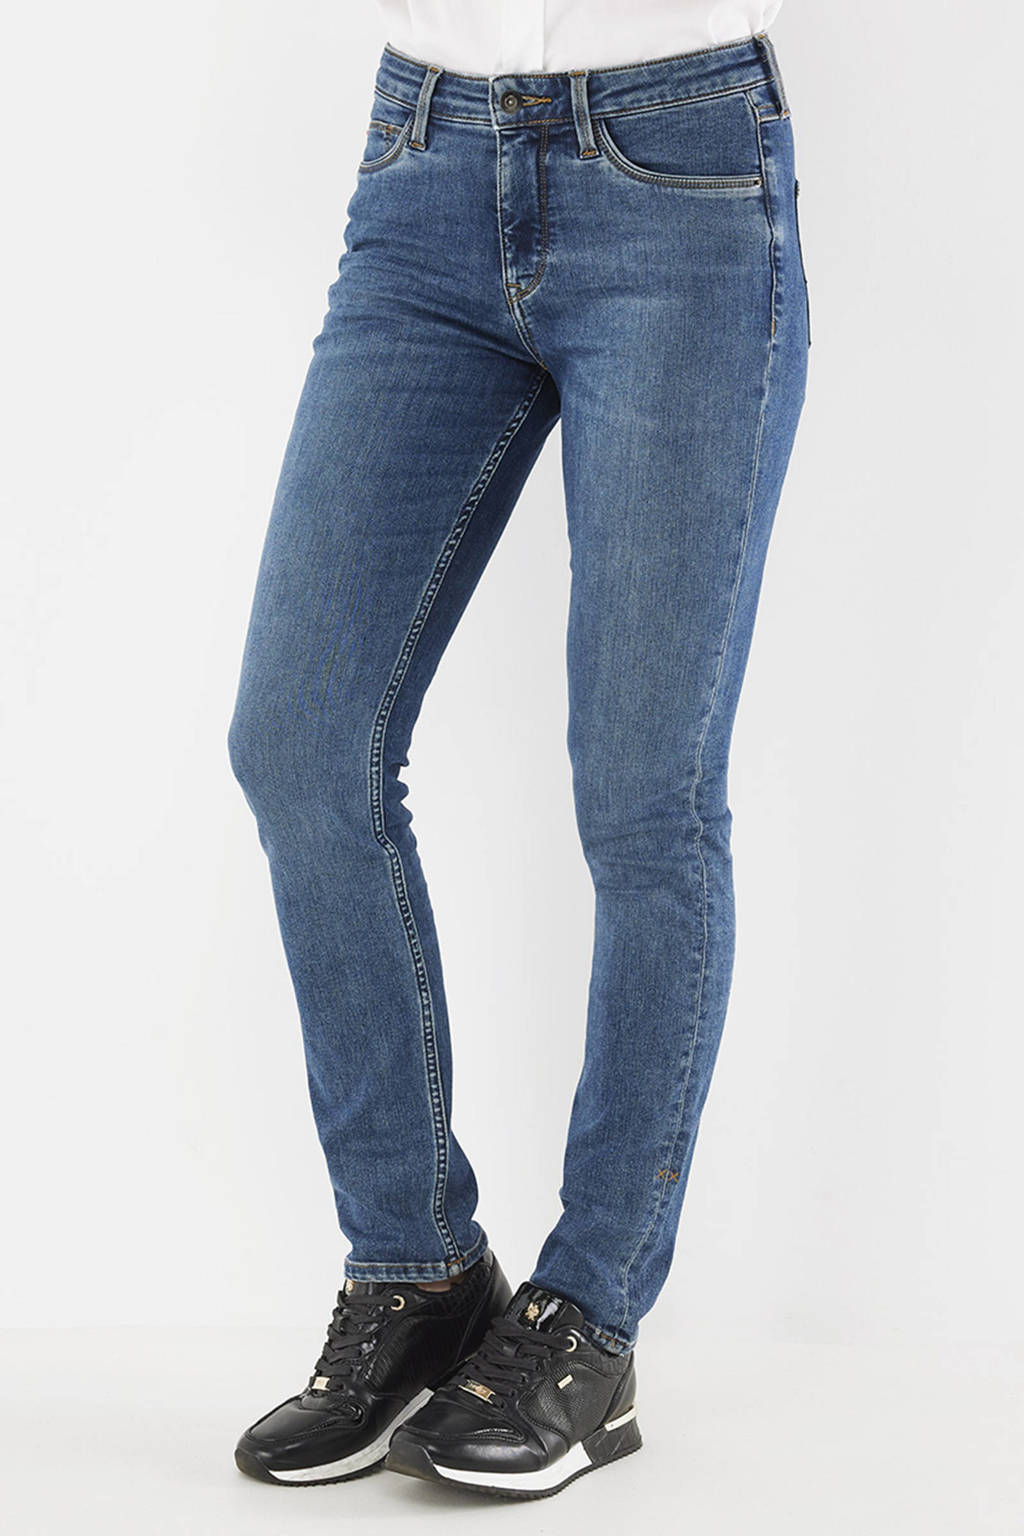 Mexx slim fit jeans classic blue